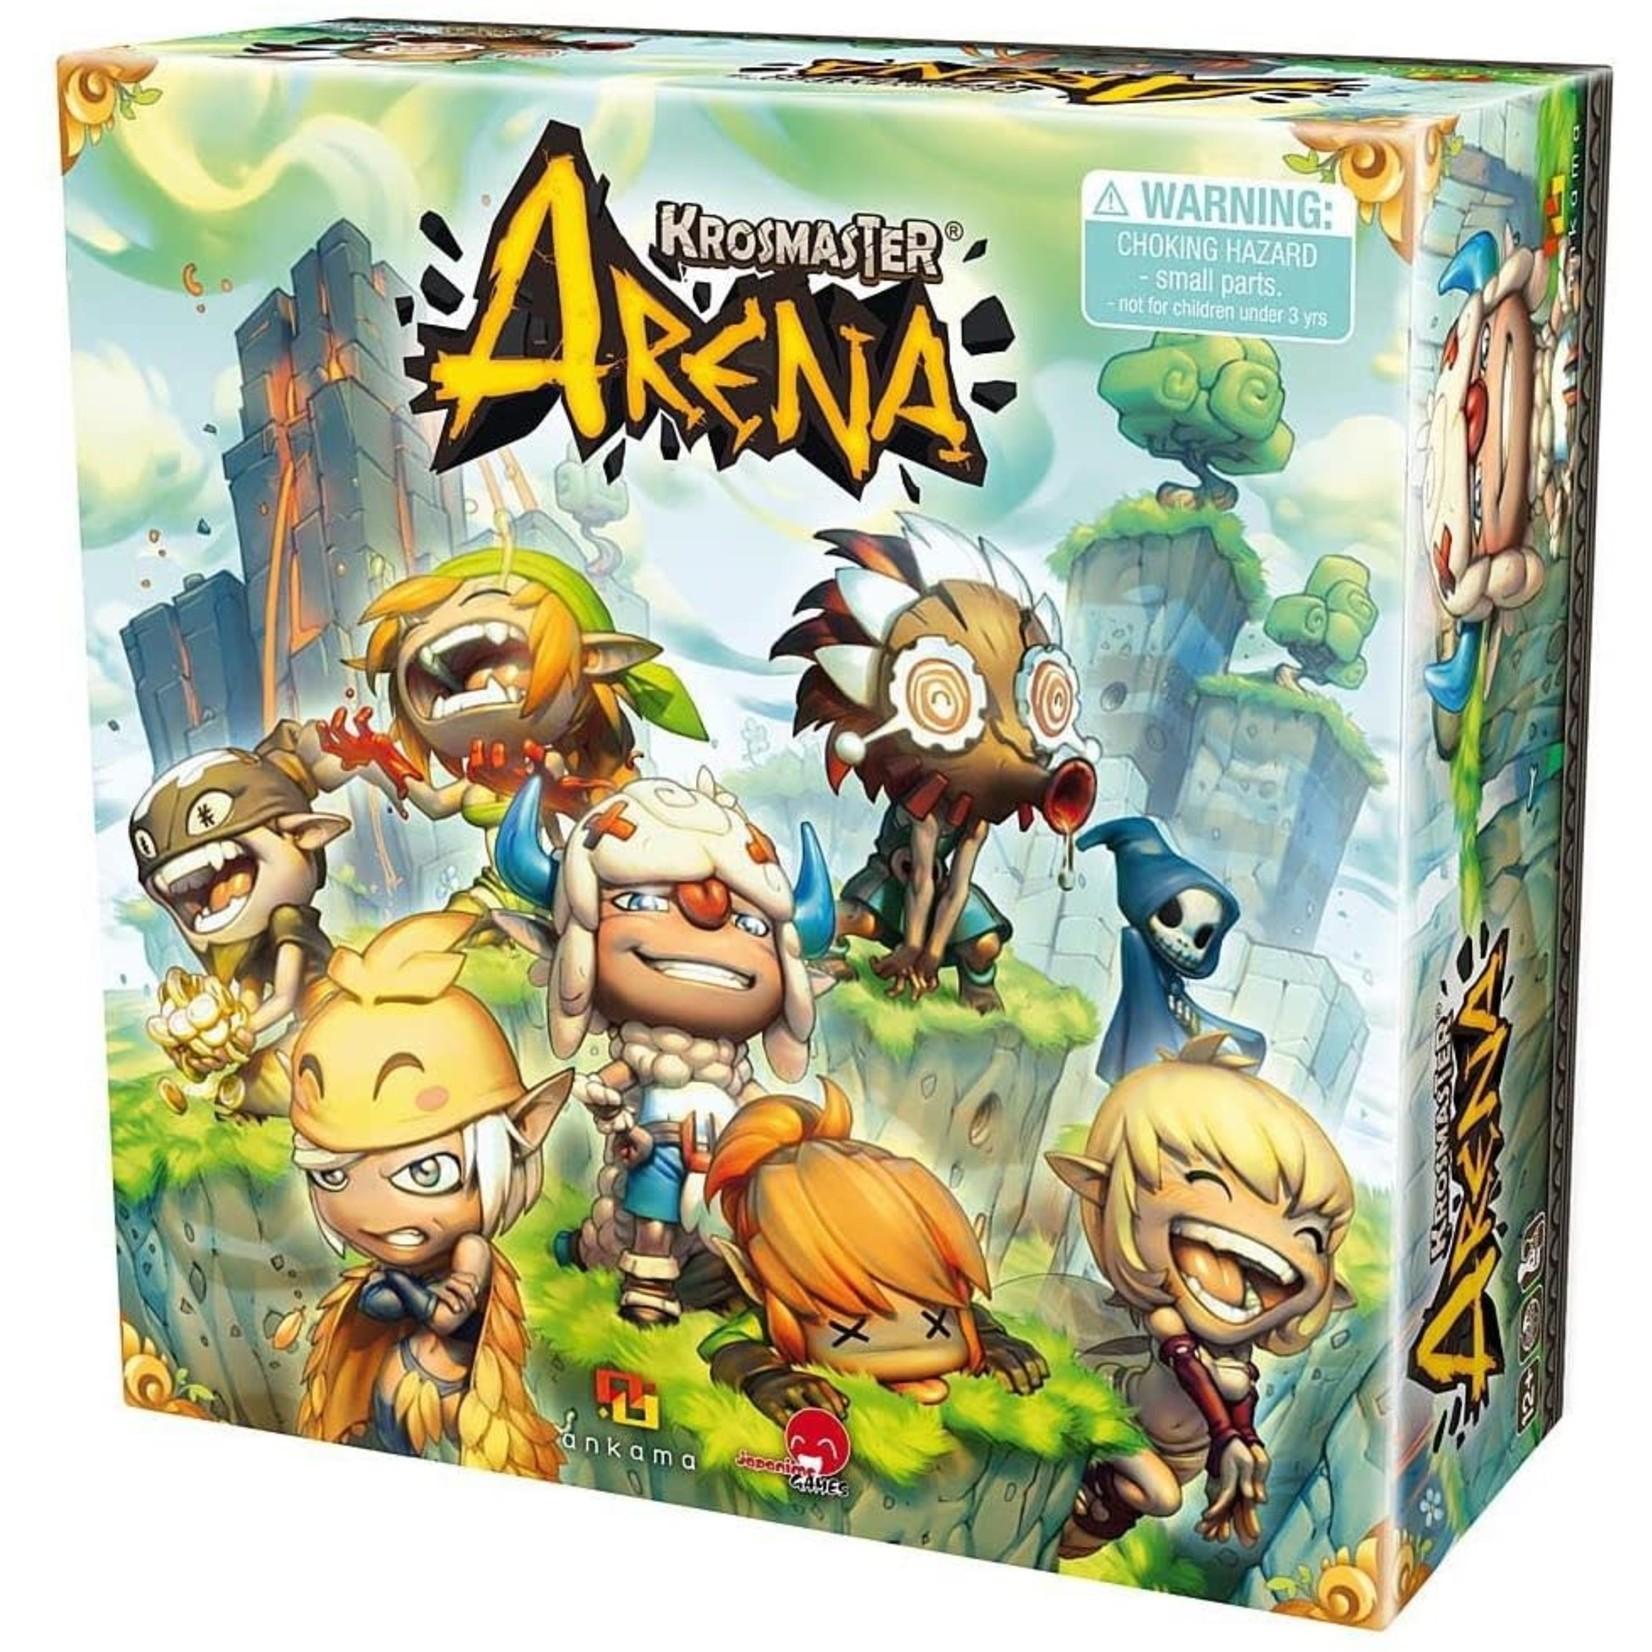 Ankama Krosmaster: Arena